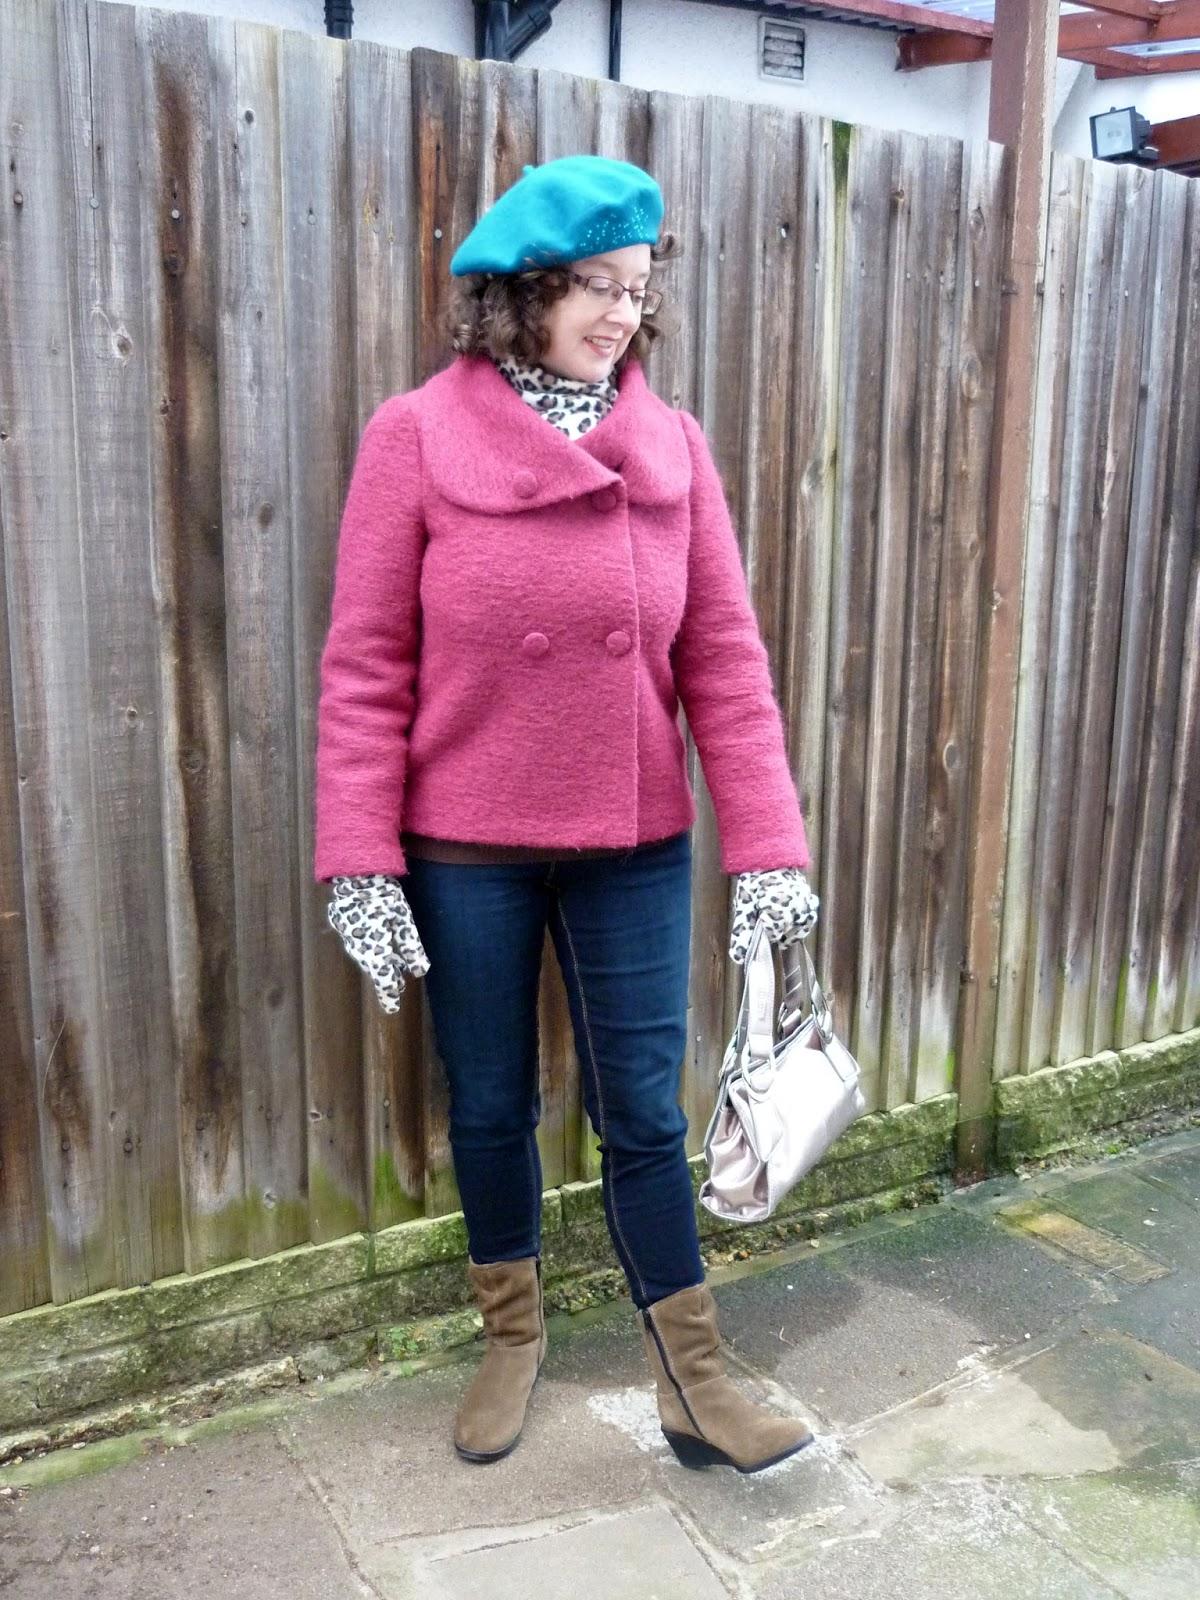 Minuet Raspberry Wool & Cashmere Jacket, Dorothy Perkins Petite Jeans, Beret, Leopard Print Scarf & Gloves | Petite Silver Vixen